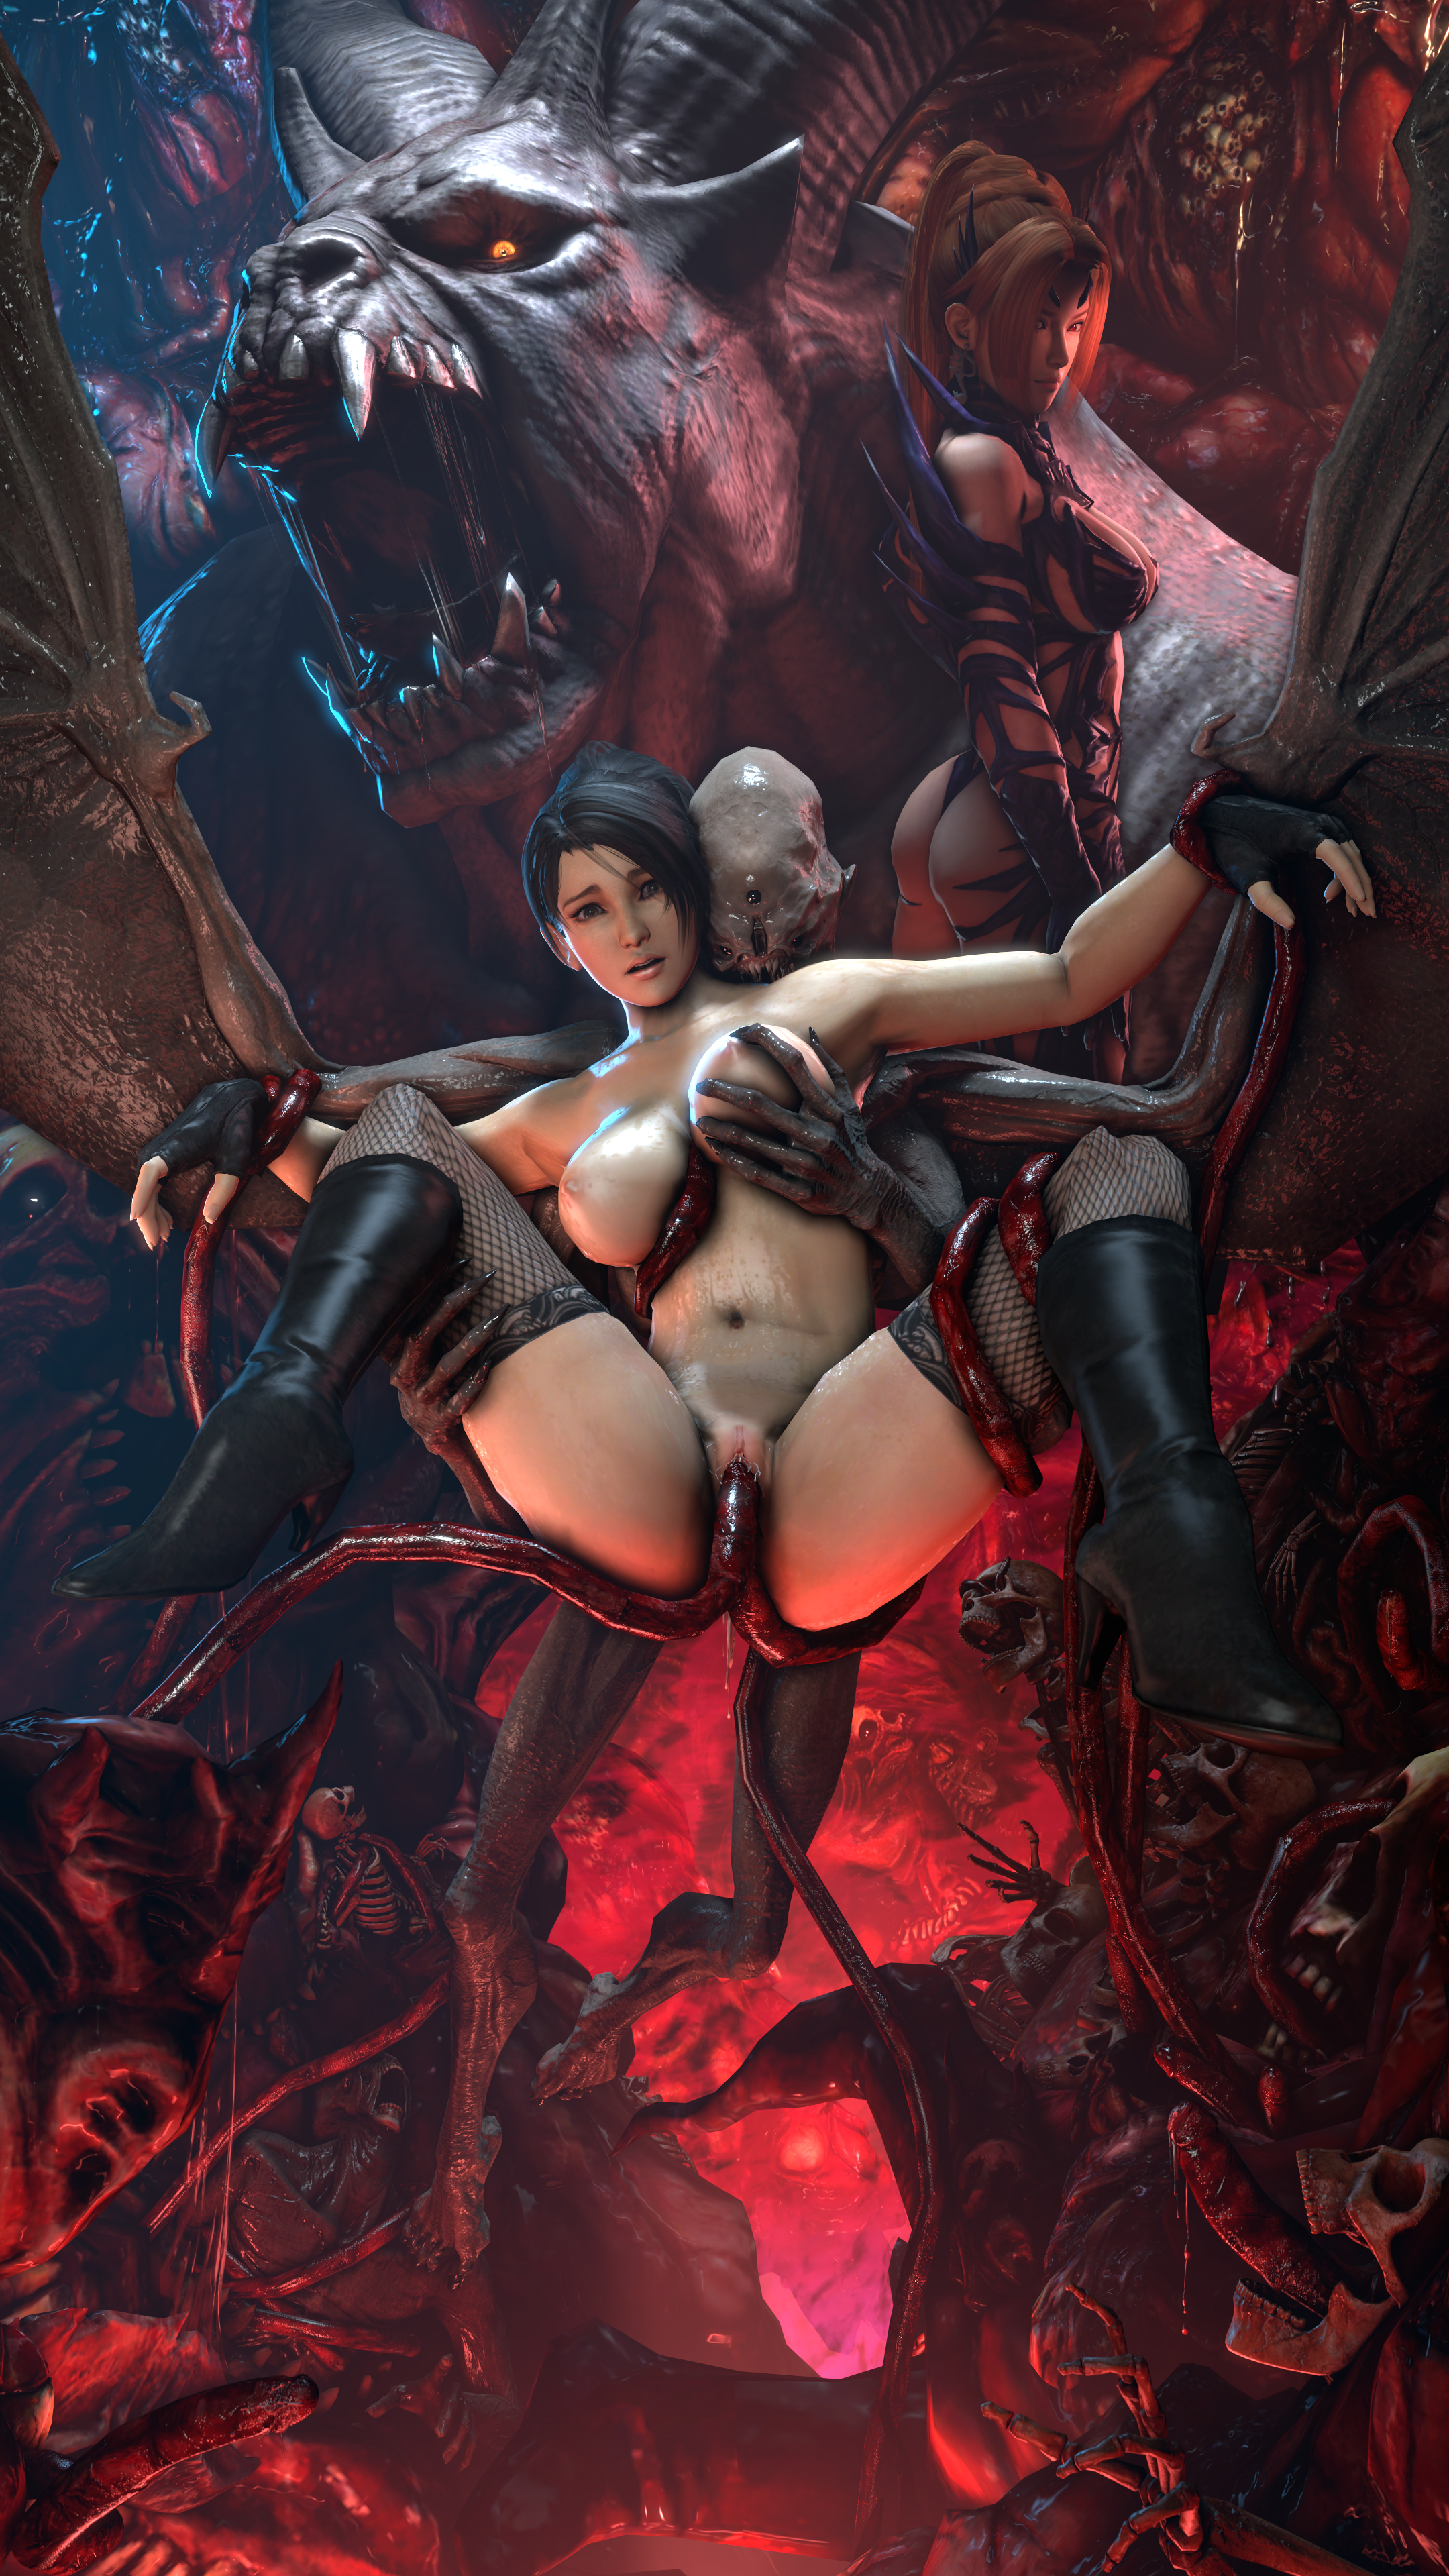 3d hentai sfm futanari starfire and raven fuck 2